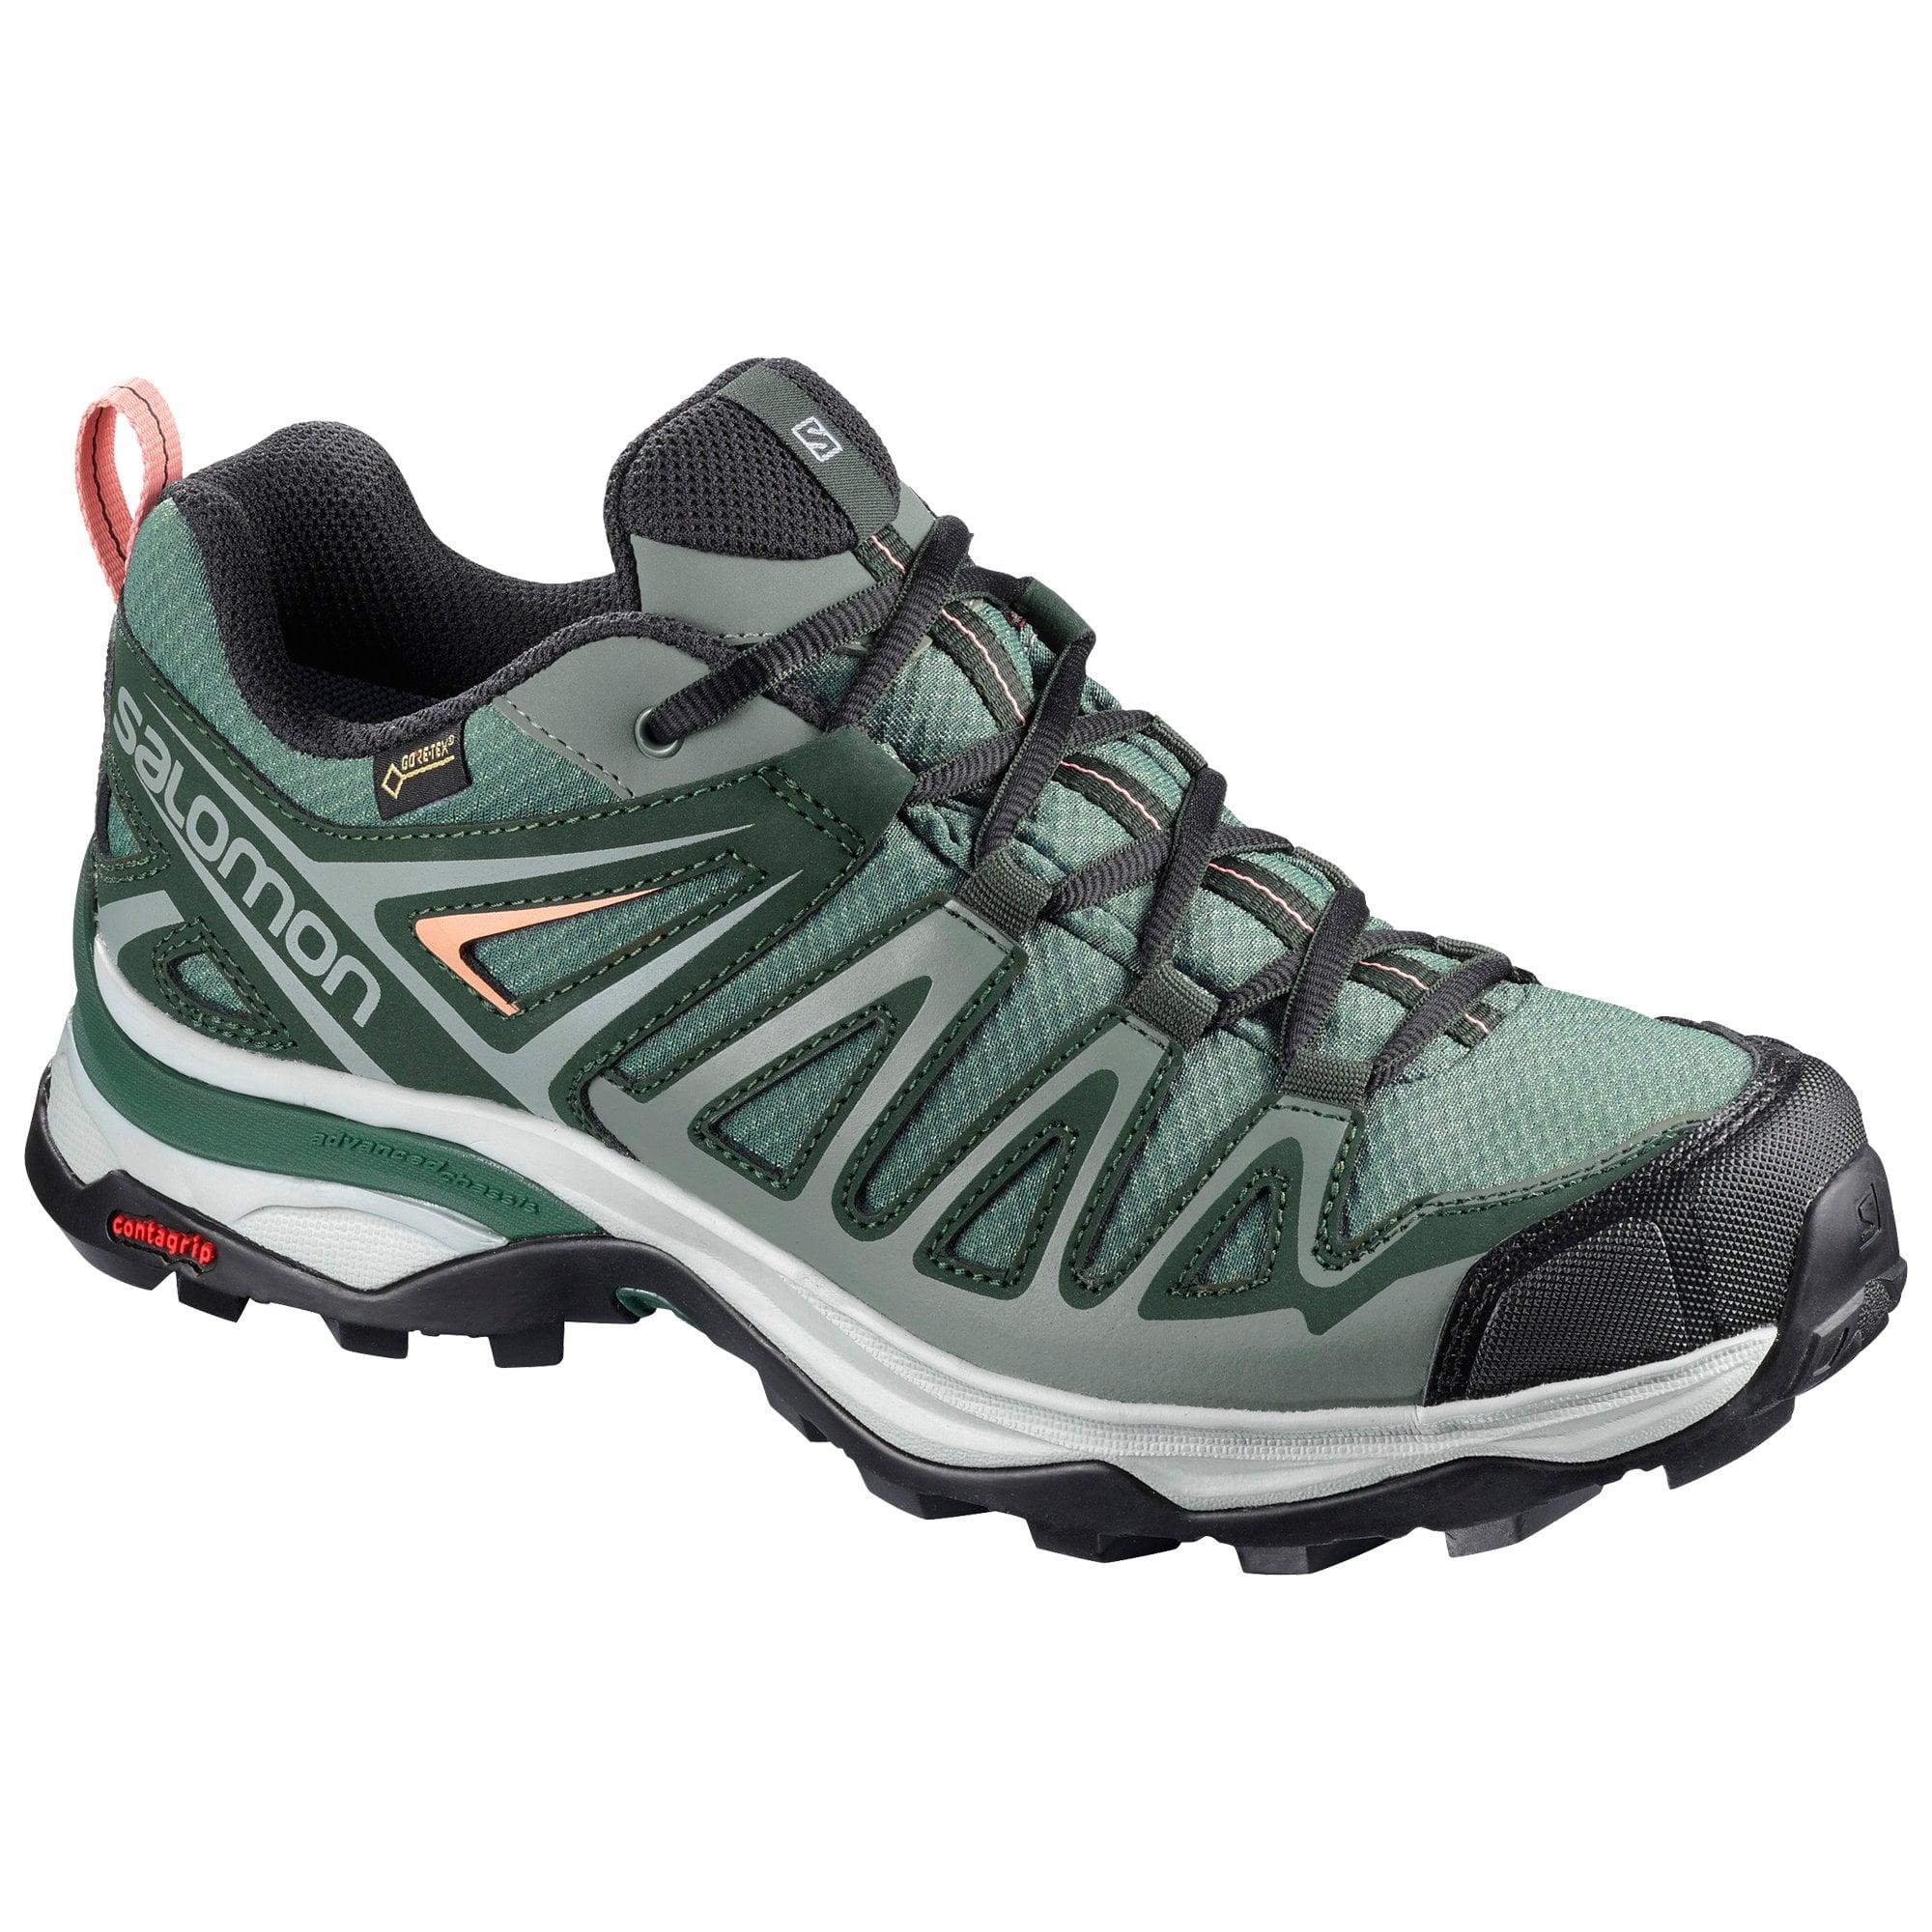 Anual Milagroso Quien  Salomon Womens X Ultra 3 Prime GTX Walking Shoes - Footwear from Gaynor  Sports UK